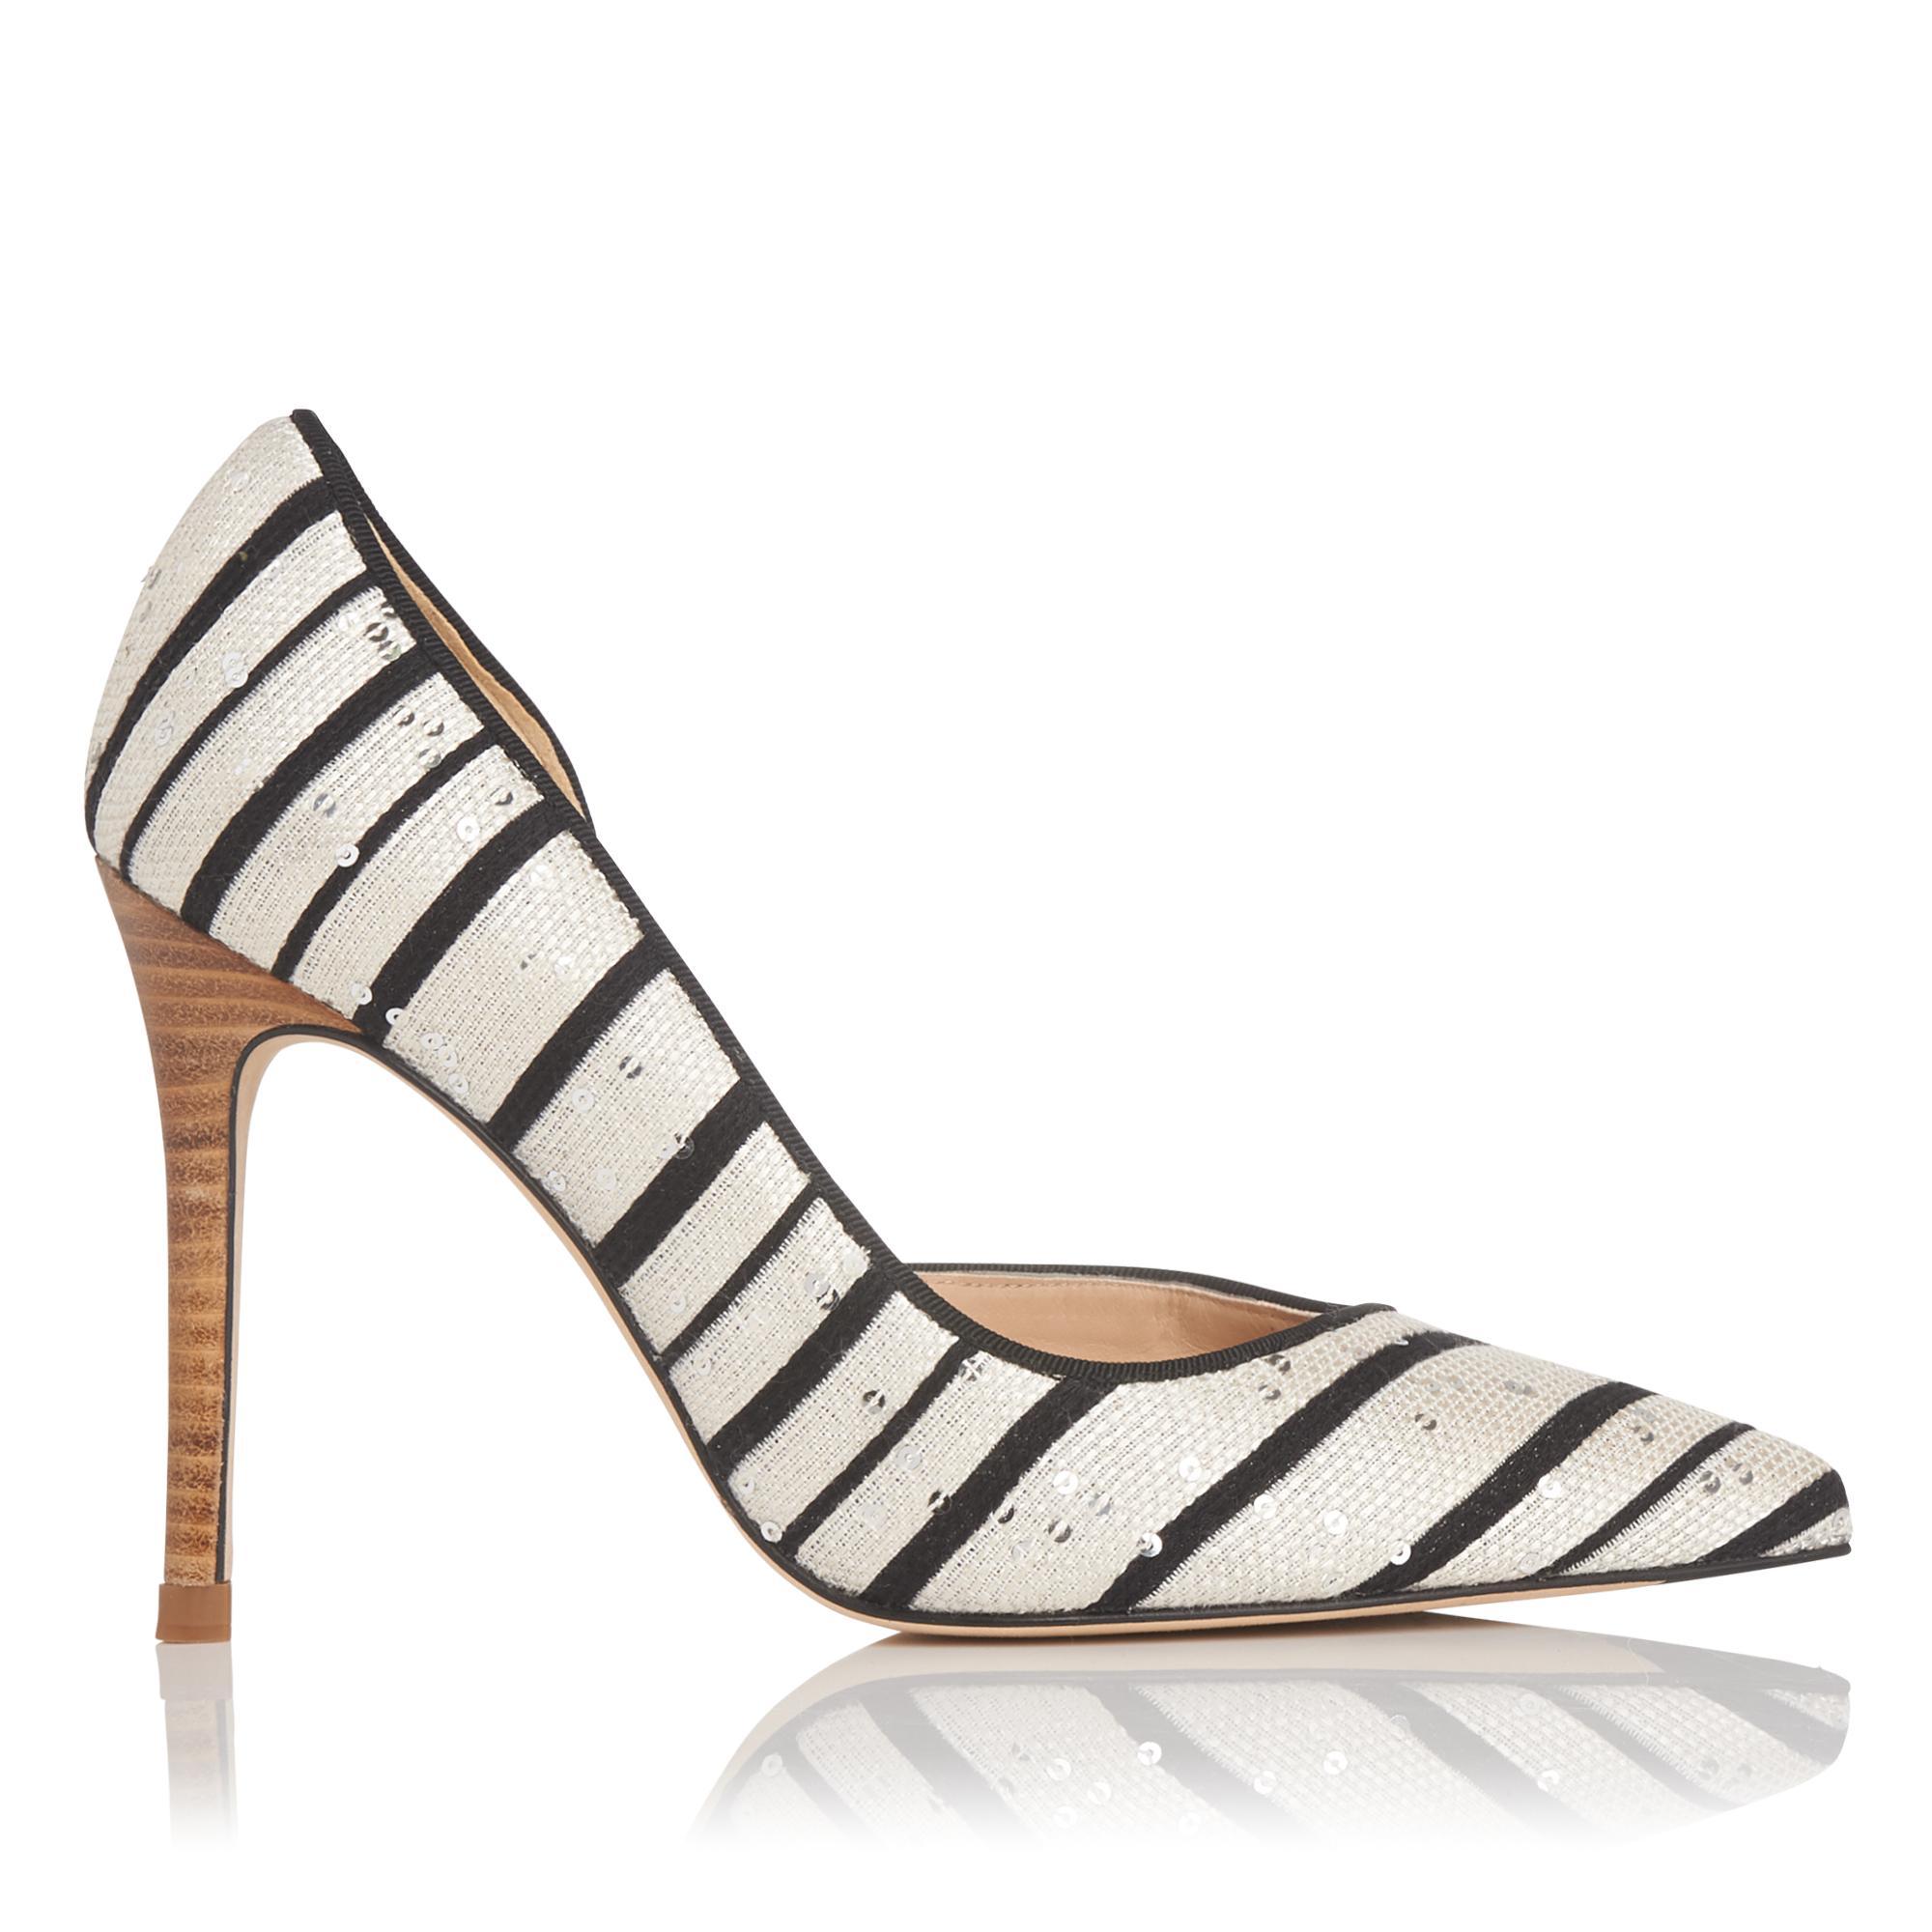 k bennett Zara Black White L Jacquard CourtsShoes eW29bEDHIY